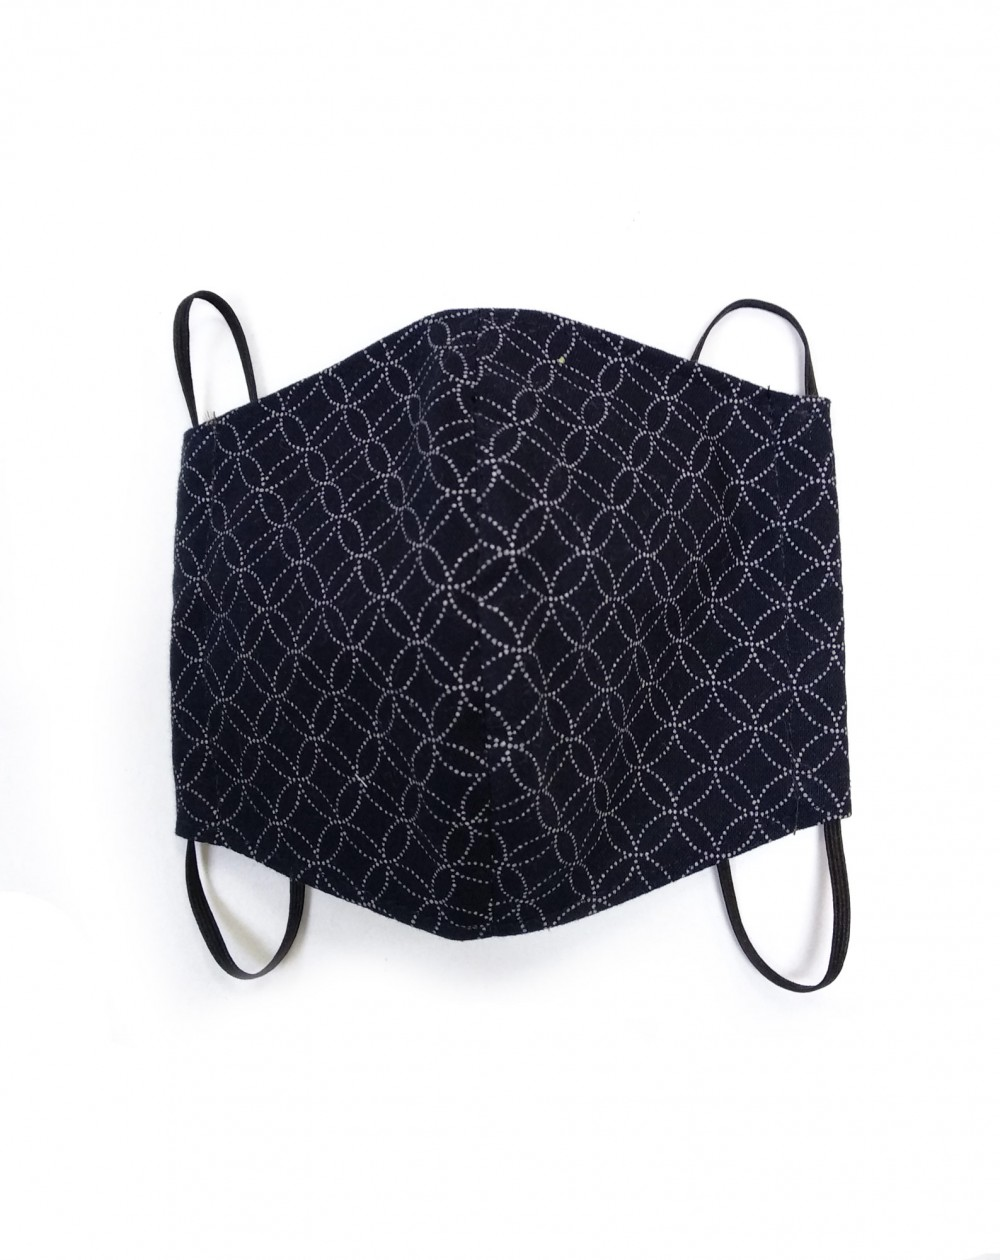 Masque de protection cercles Shippo marine